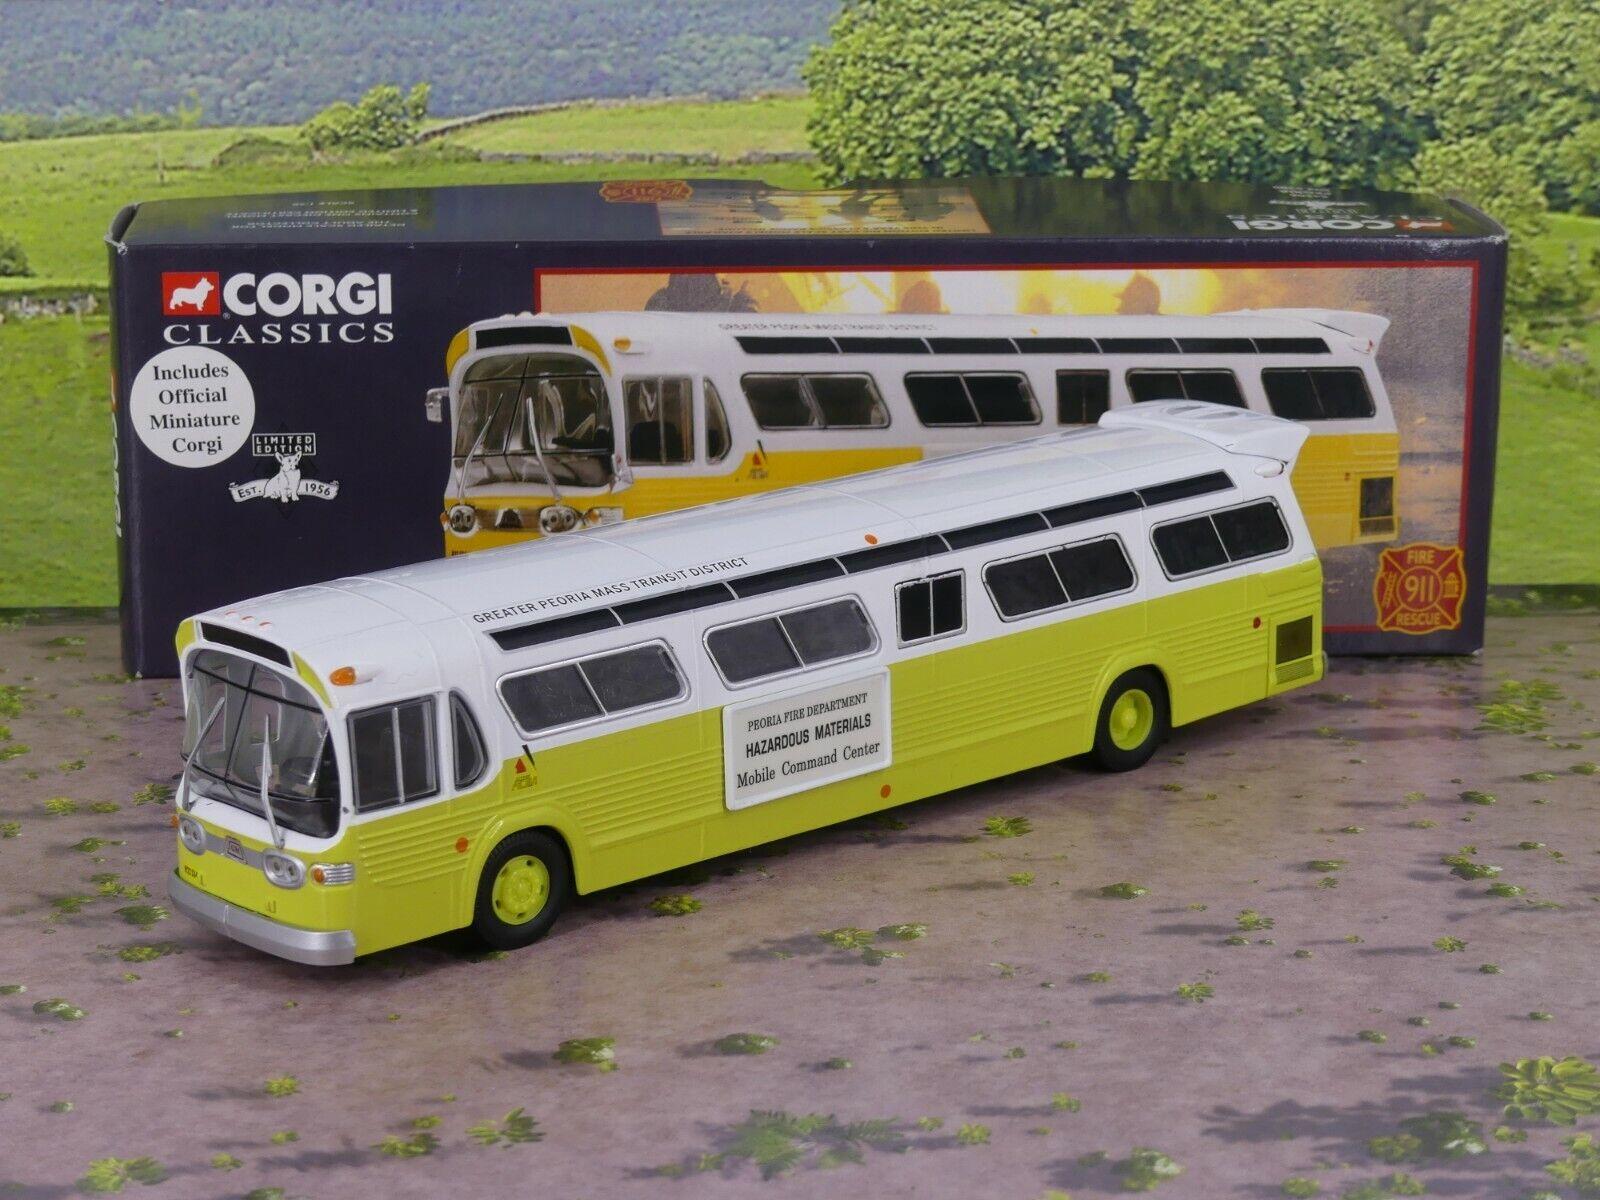 Corgi 54506 GM 5300 Bus Peoria Fire DepartSiet 1 50 Diecast mint boxed